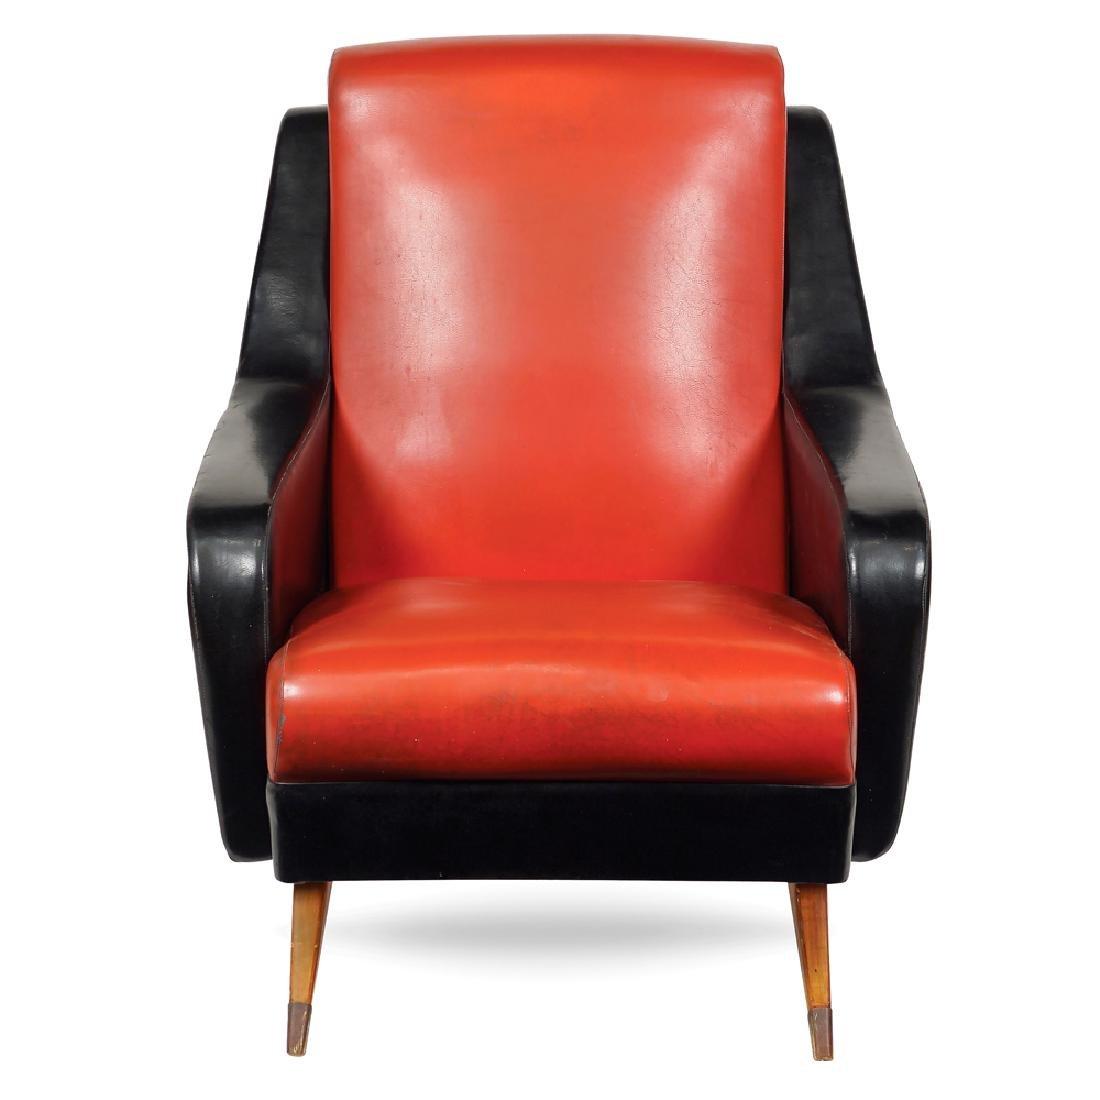 Faux leather armchair France 20th century 85x80x50 cm.